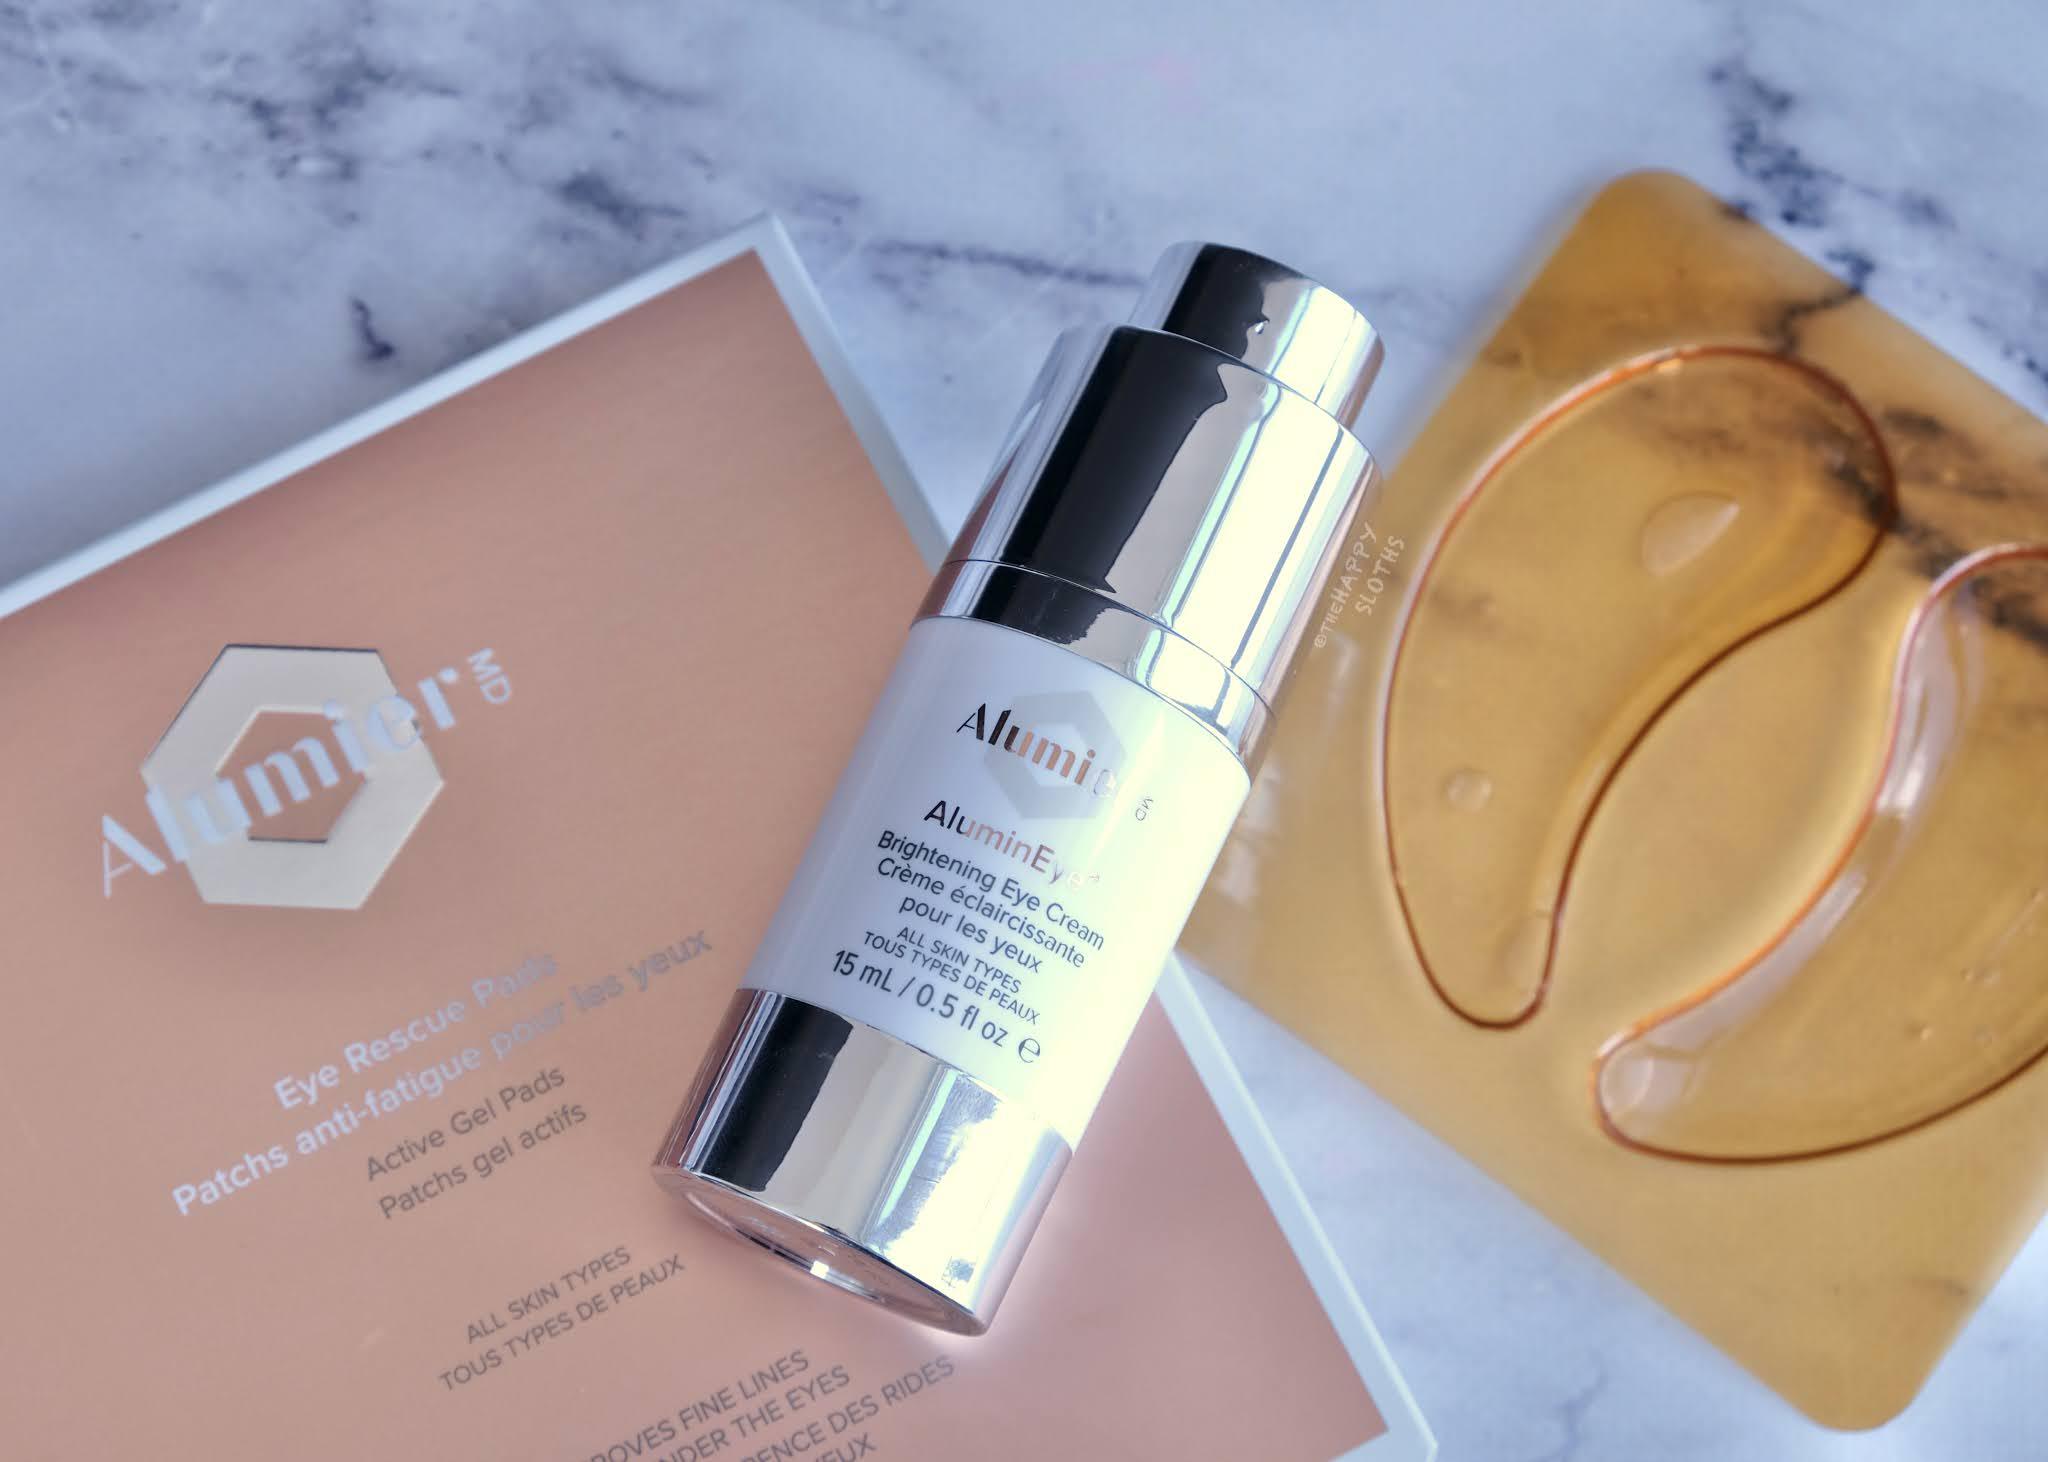 Alumier MD | Eye Rescue Pads & AluminEye Brightening Eye Cream: Review